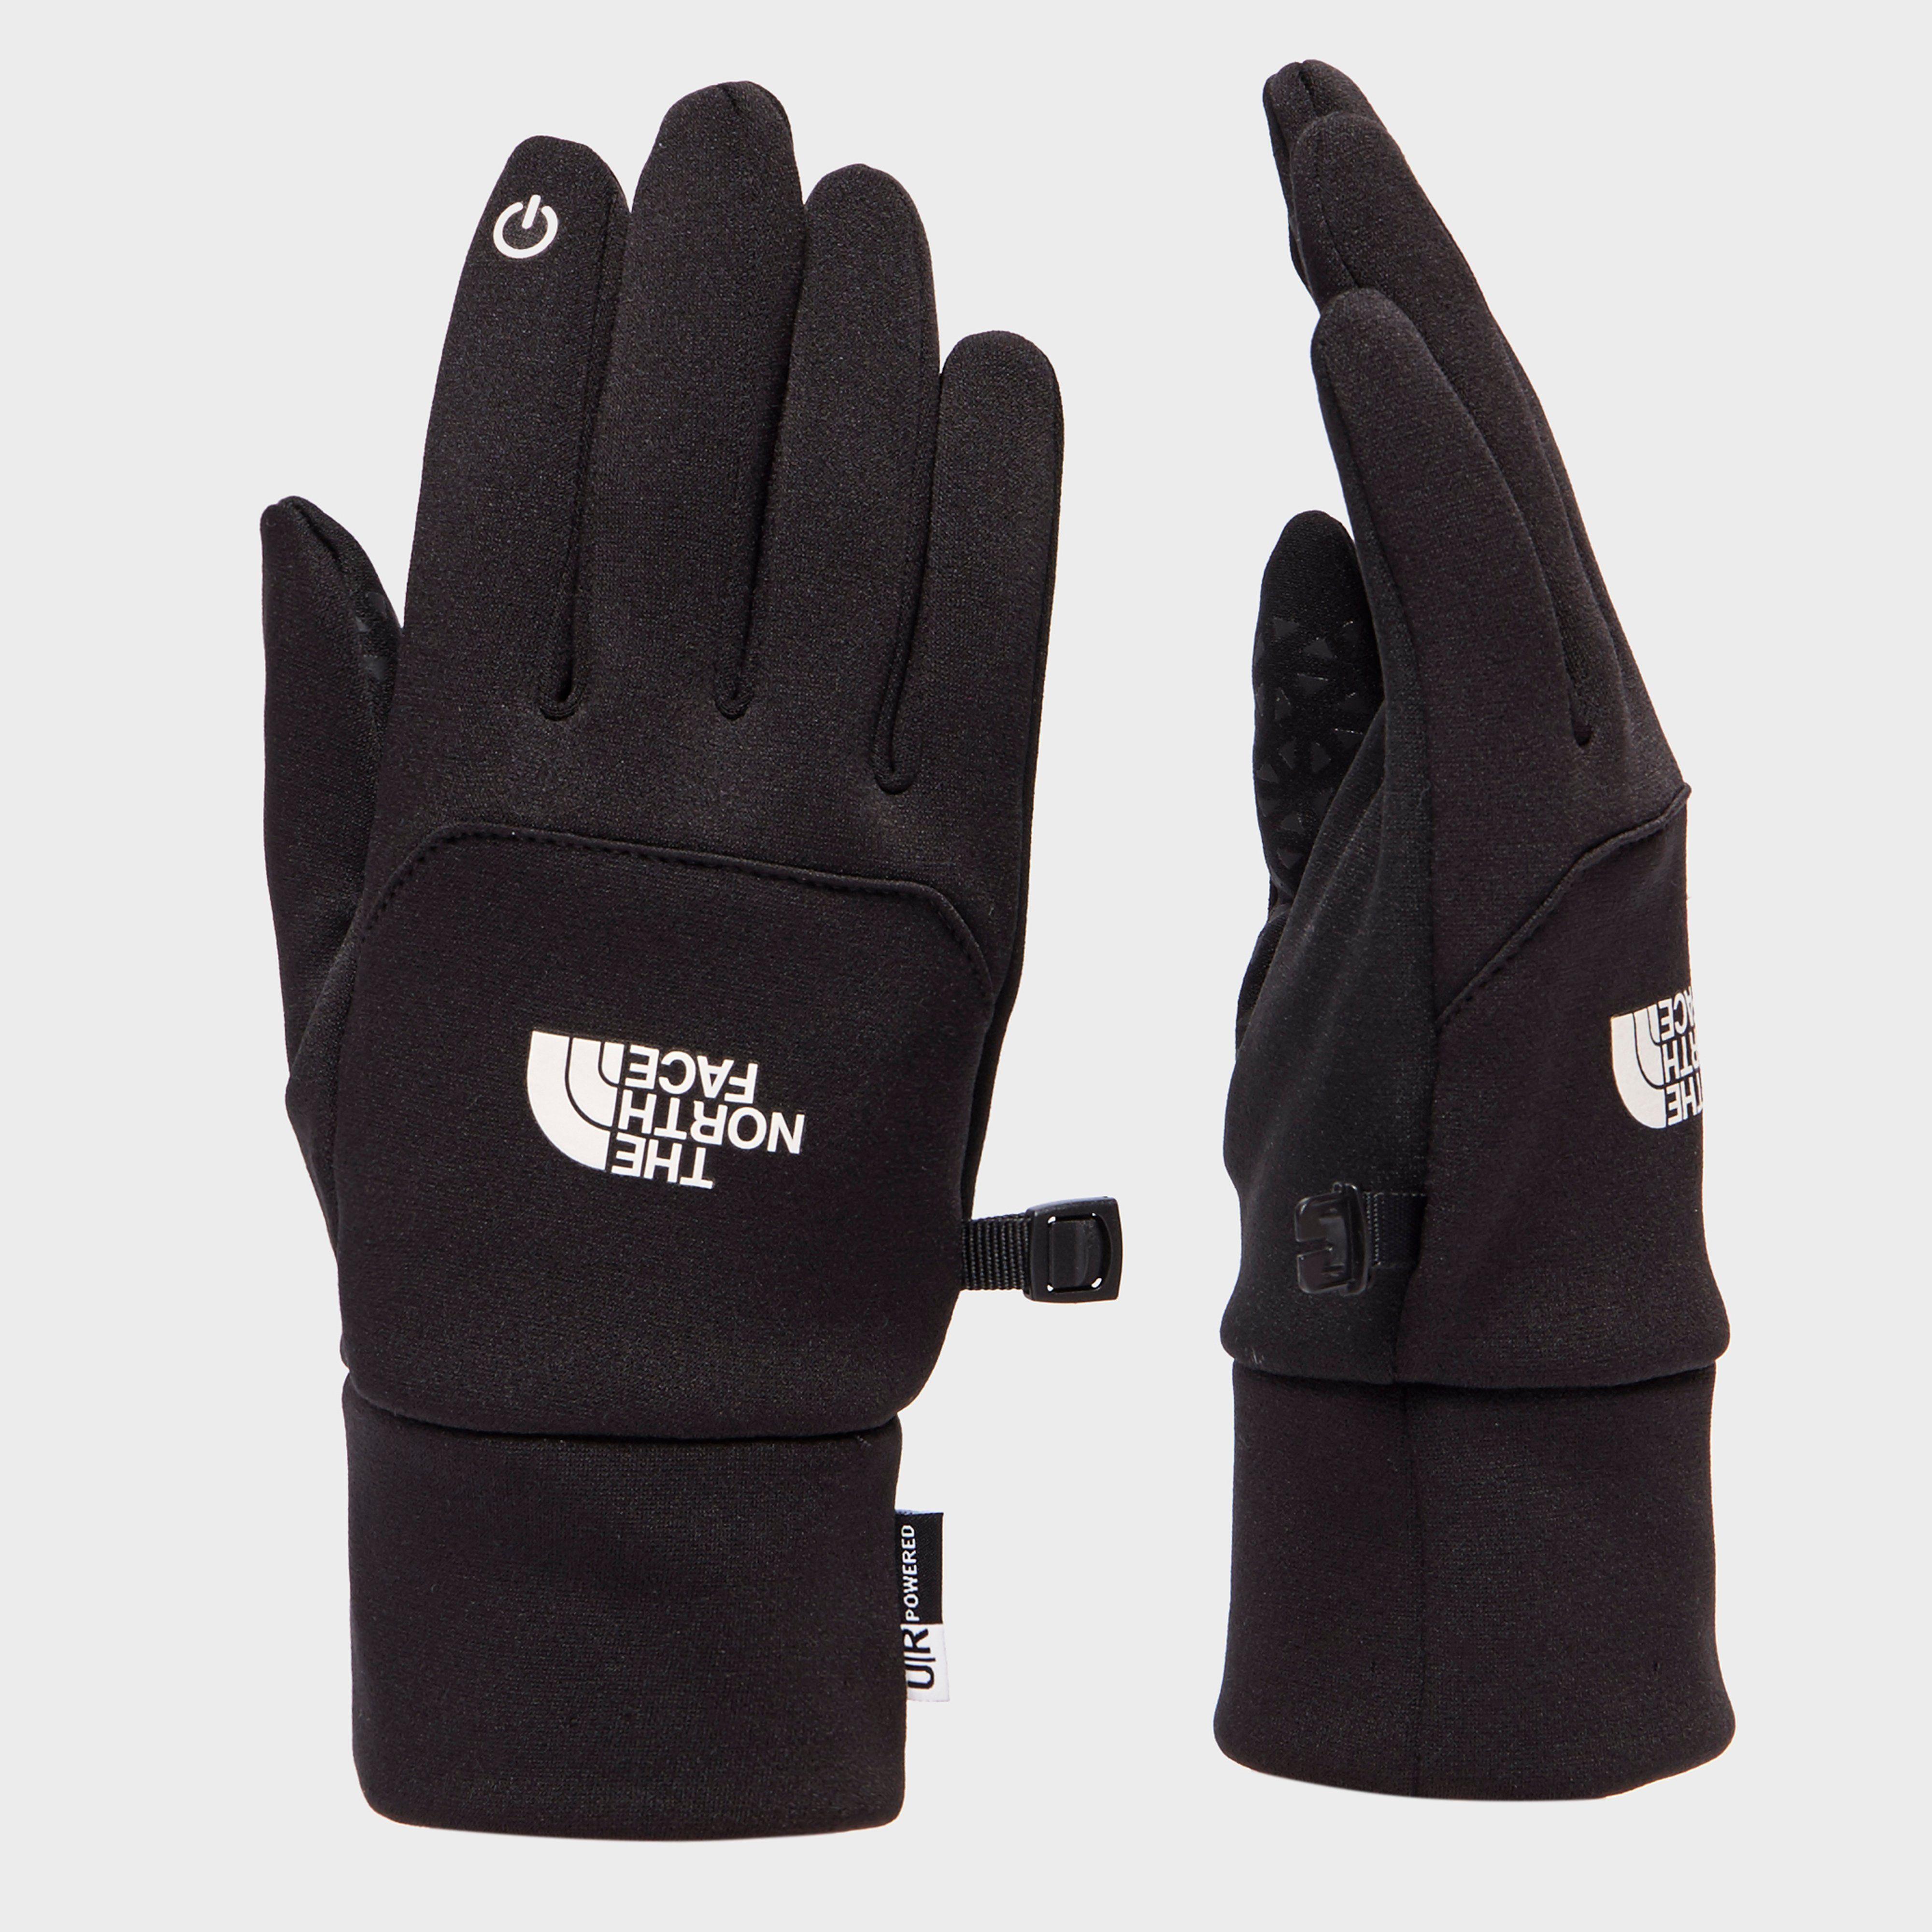 THE NORTH FACE Unisex Etip Gloves